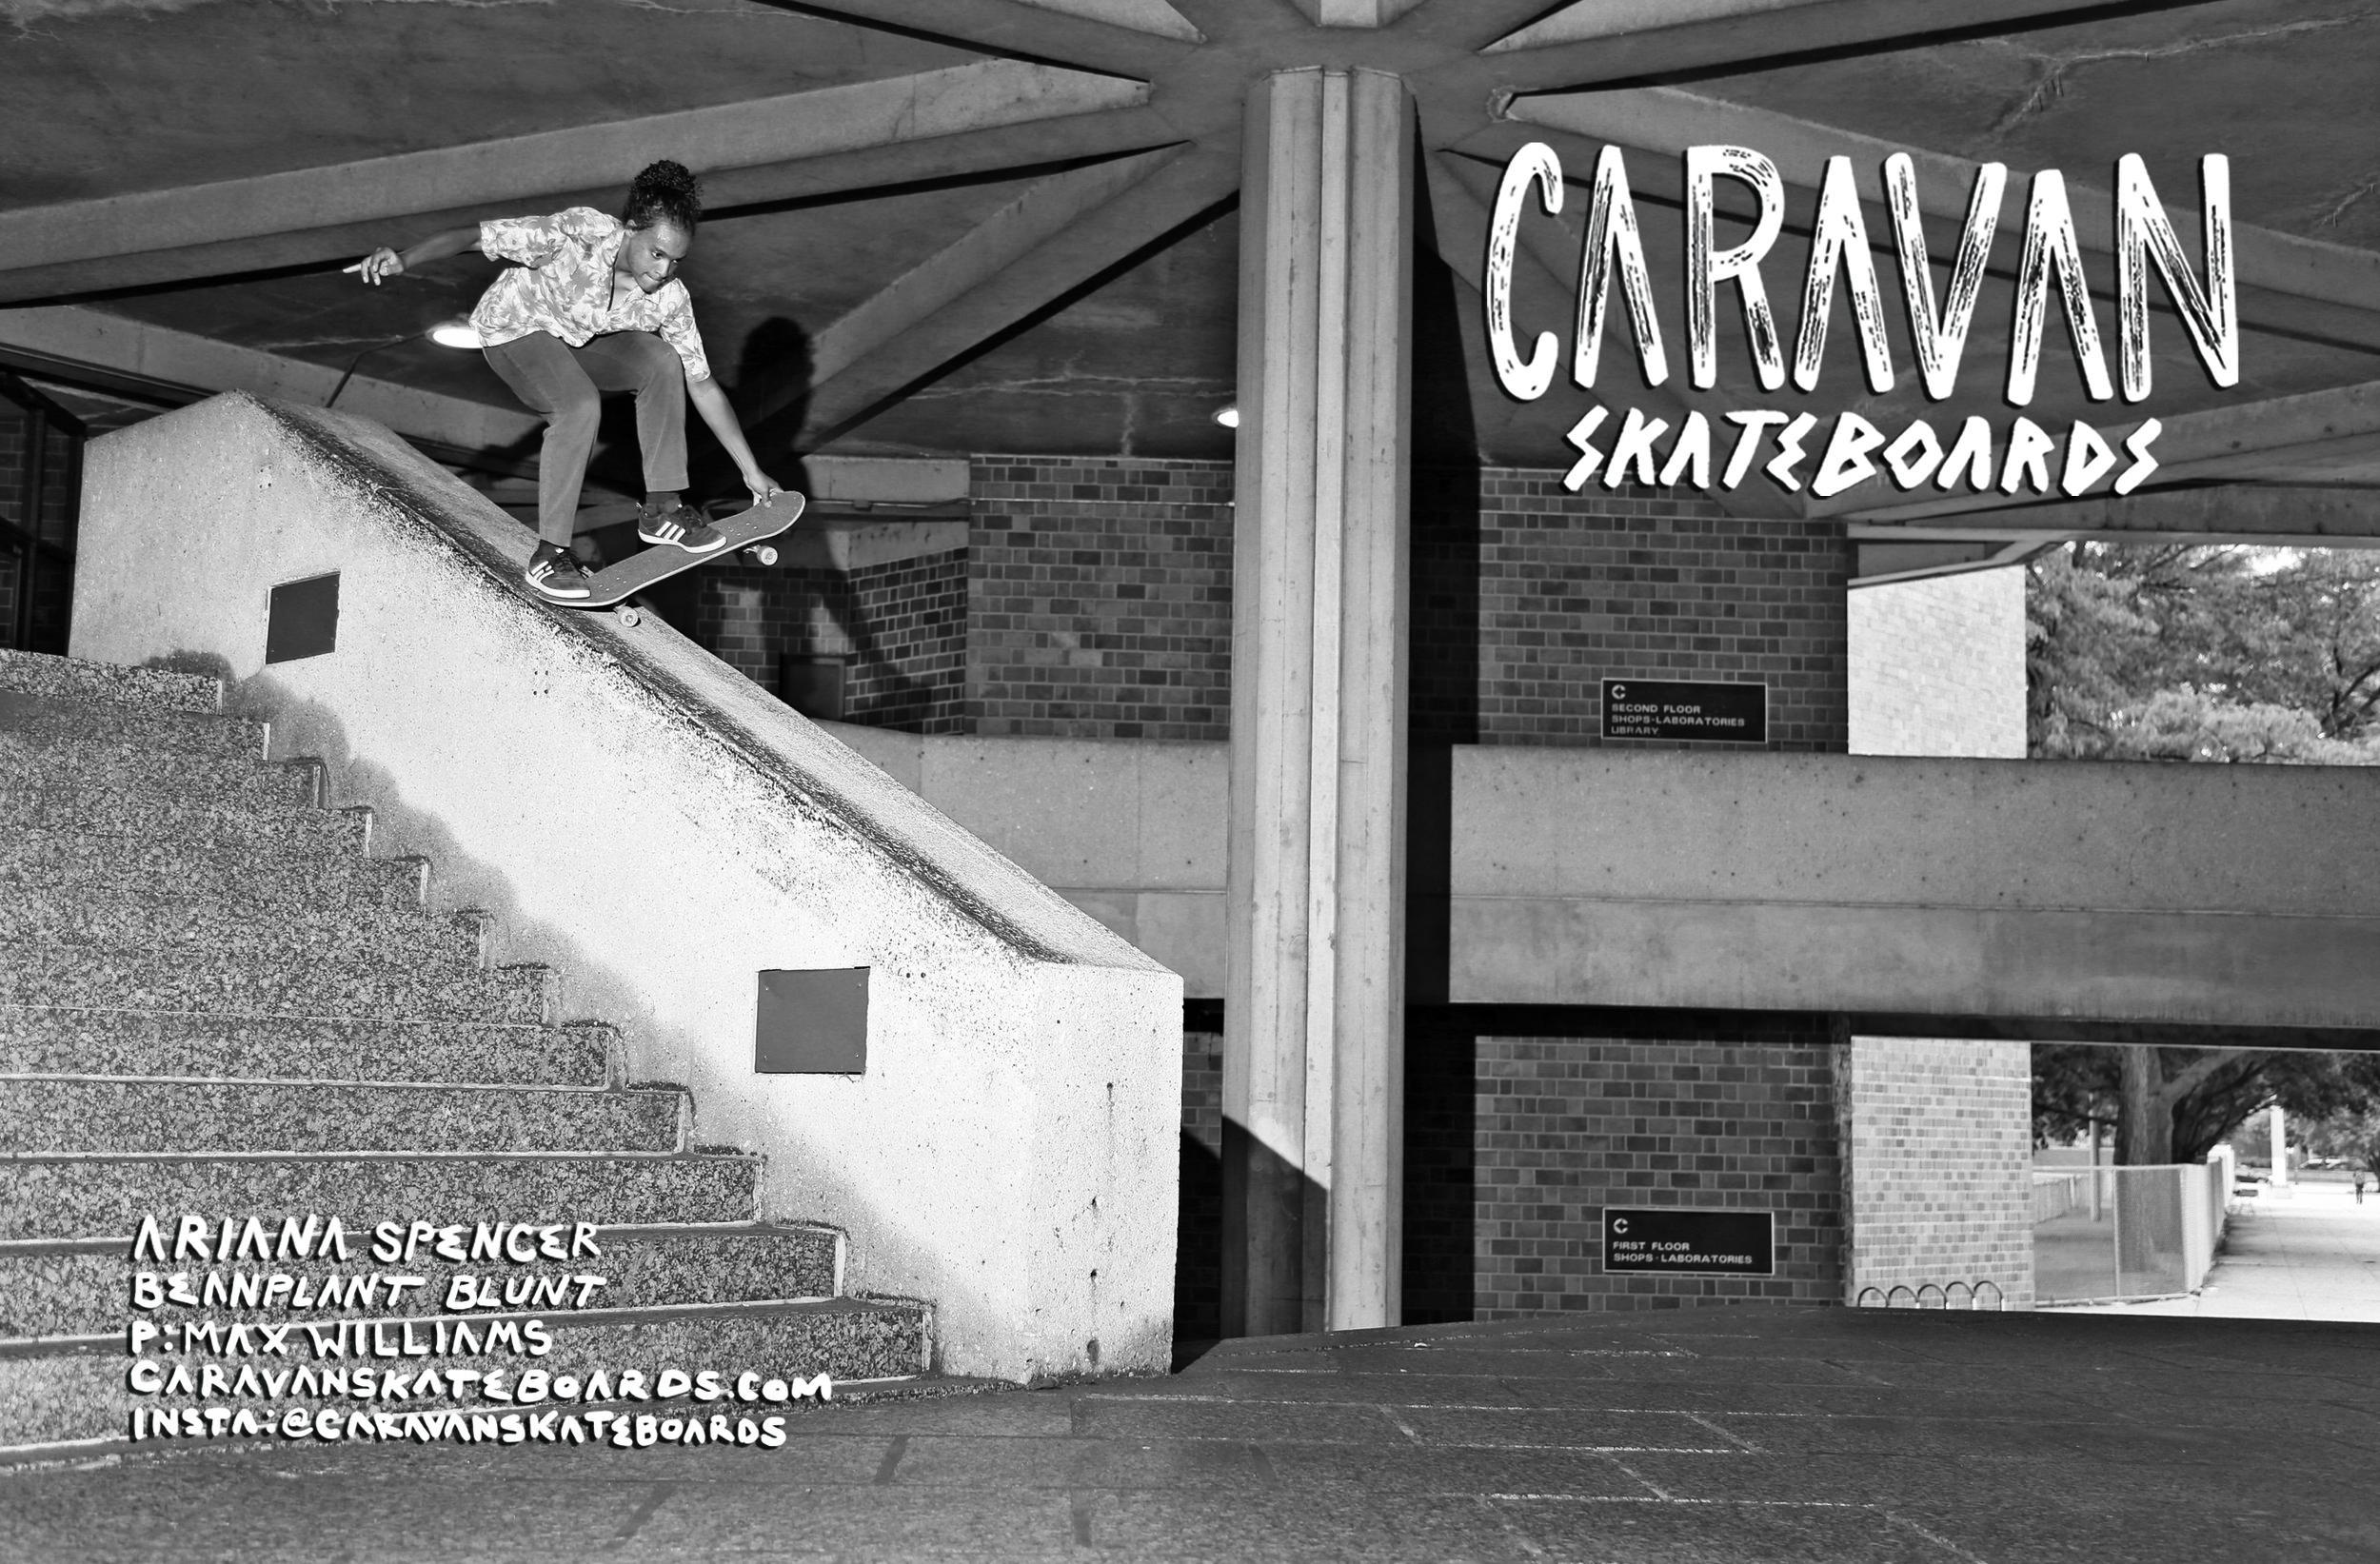 SkateJawnSept17_Caravan_BeanplantBlunt_Ariana.jpg